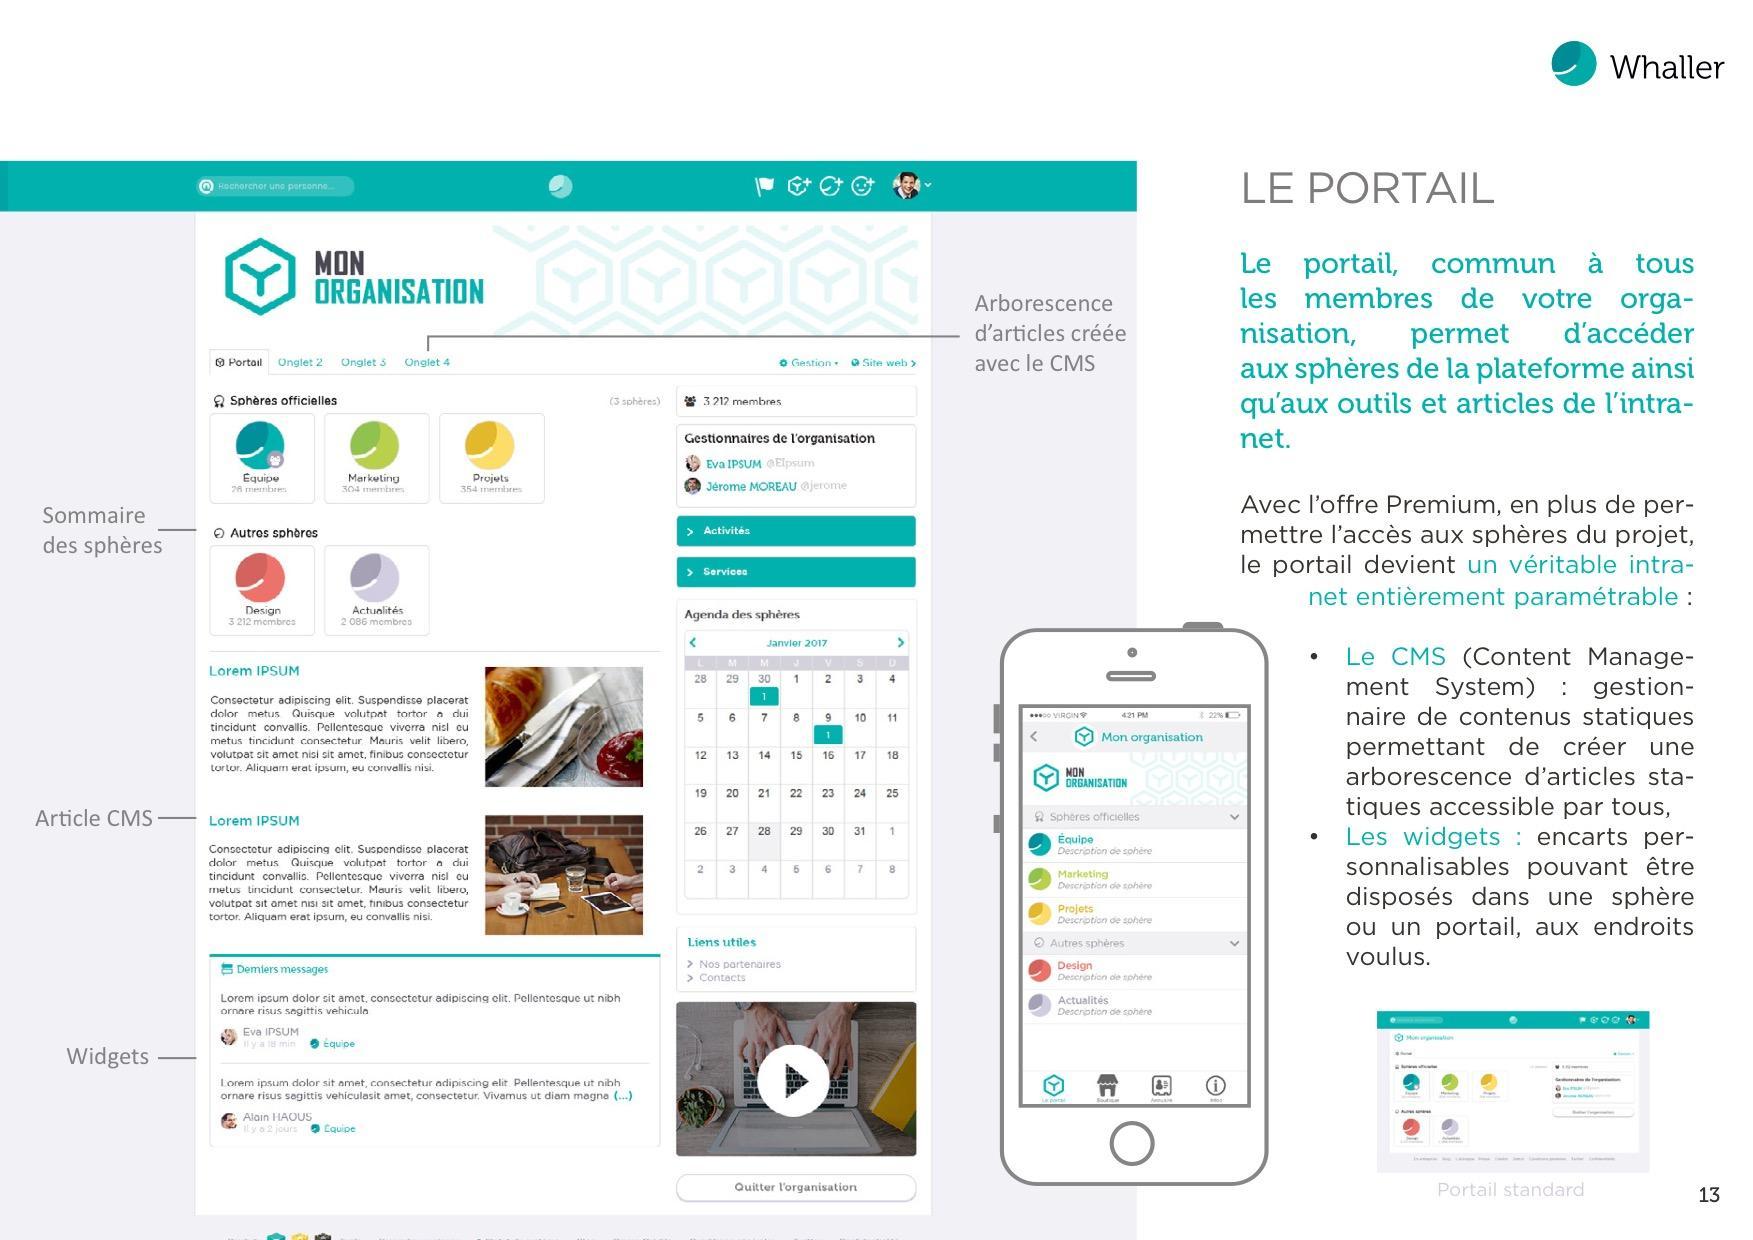 Whaller_presentation_FR 13-13.jpeg